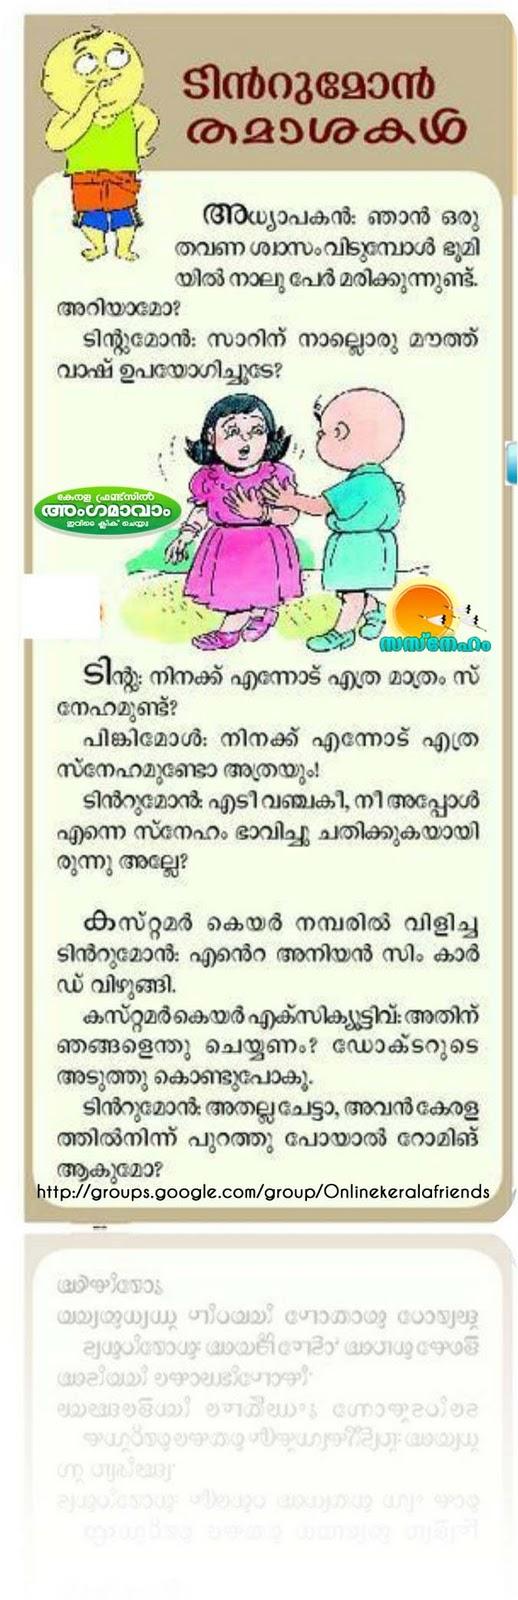 Joke Images Malayalam : images, malayalam, Email, Forwards,, Orkut, Scraps, Messages:, Tintumon, School-A, Joke,, Enjoy